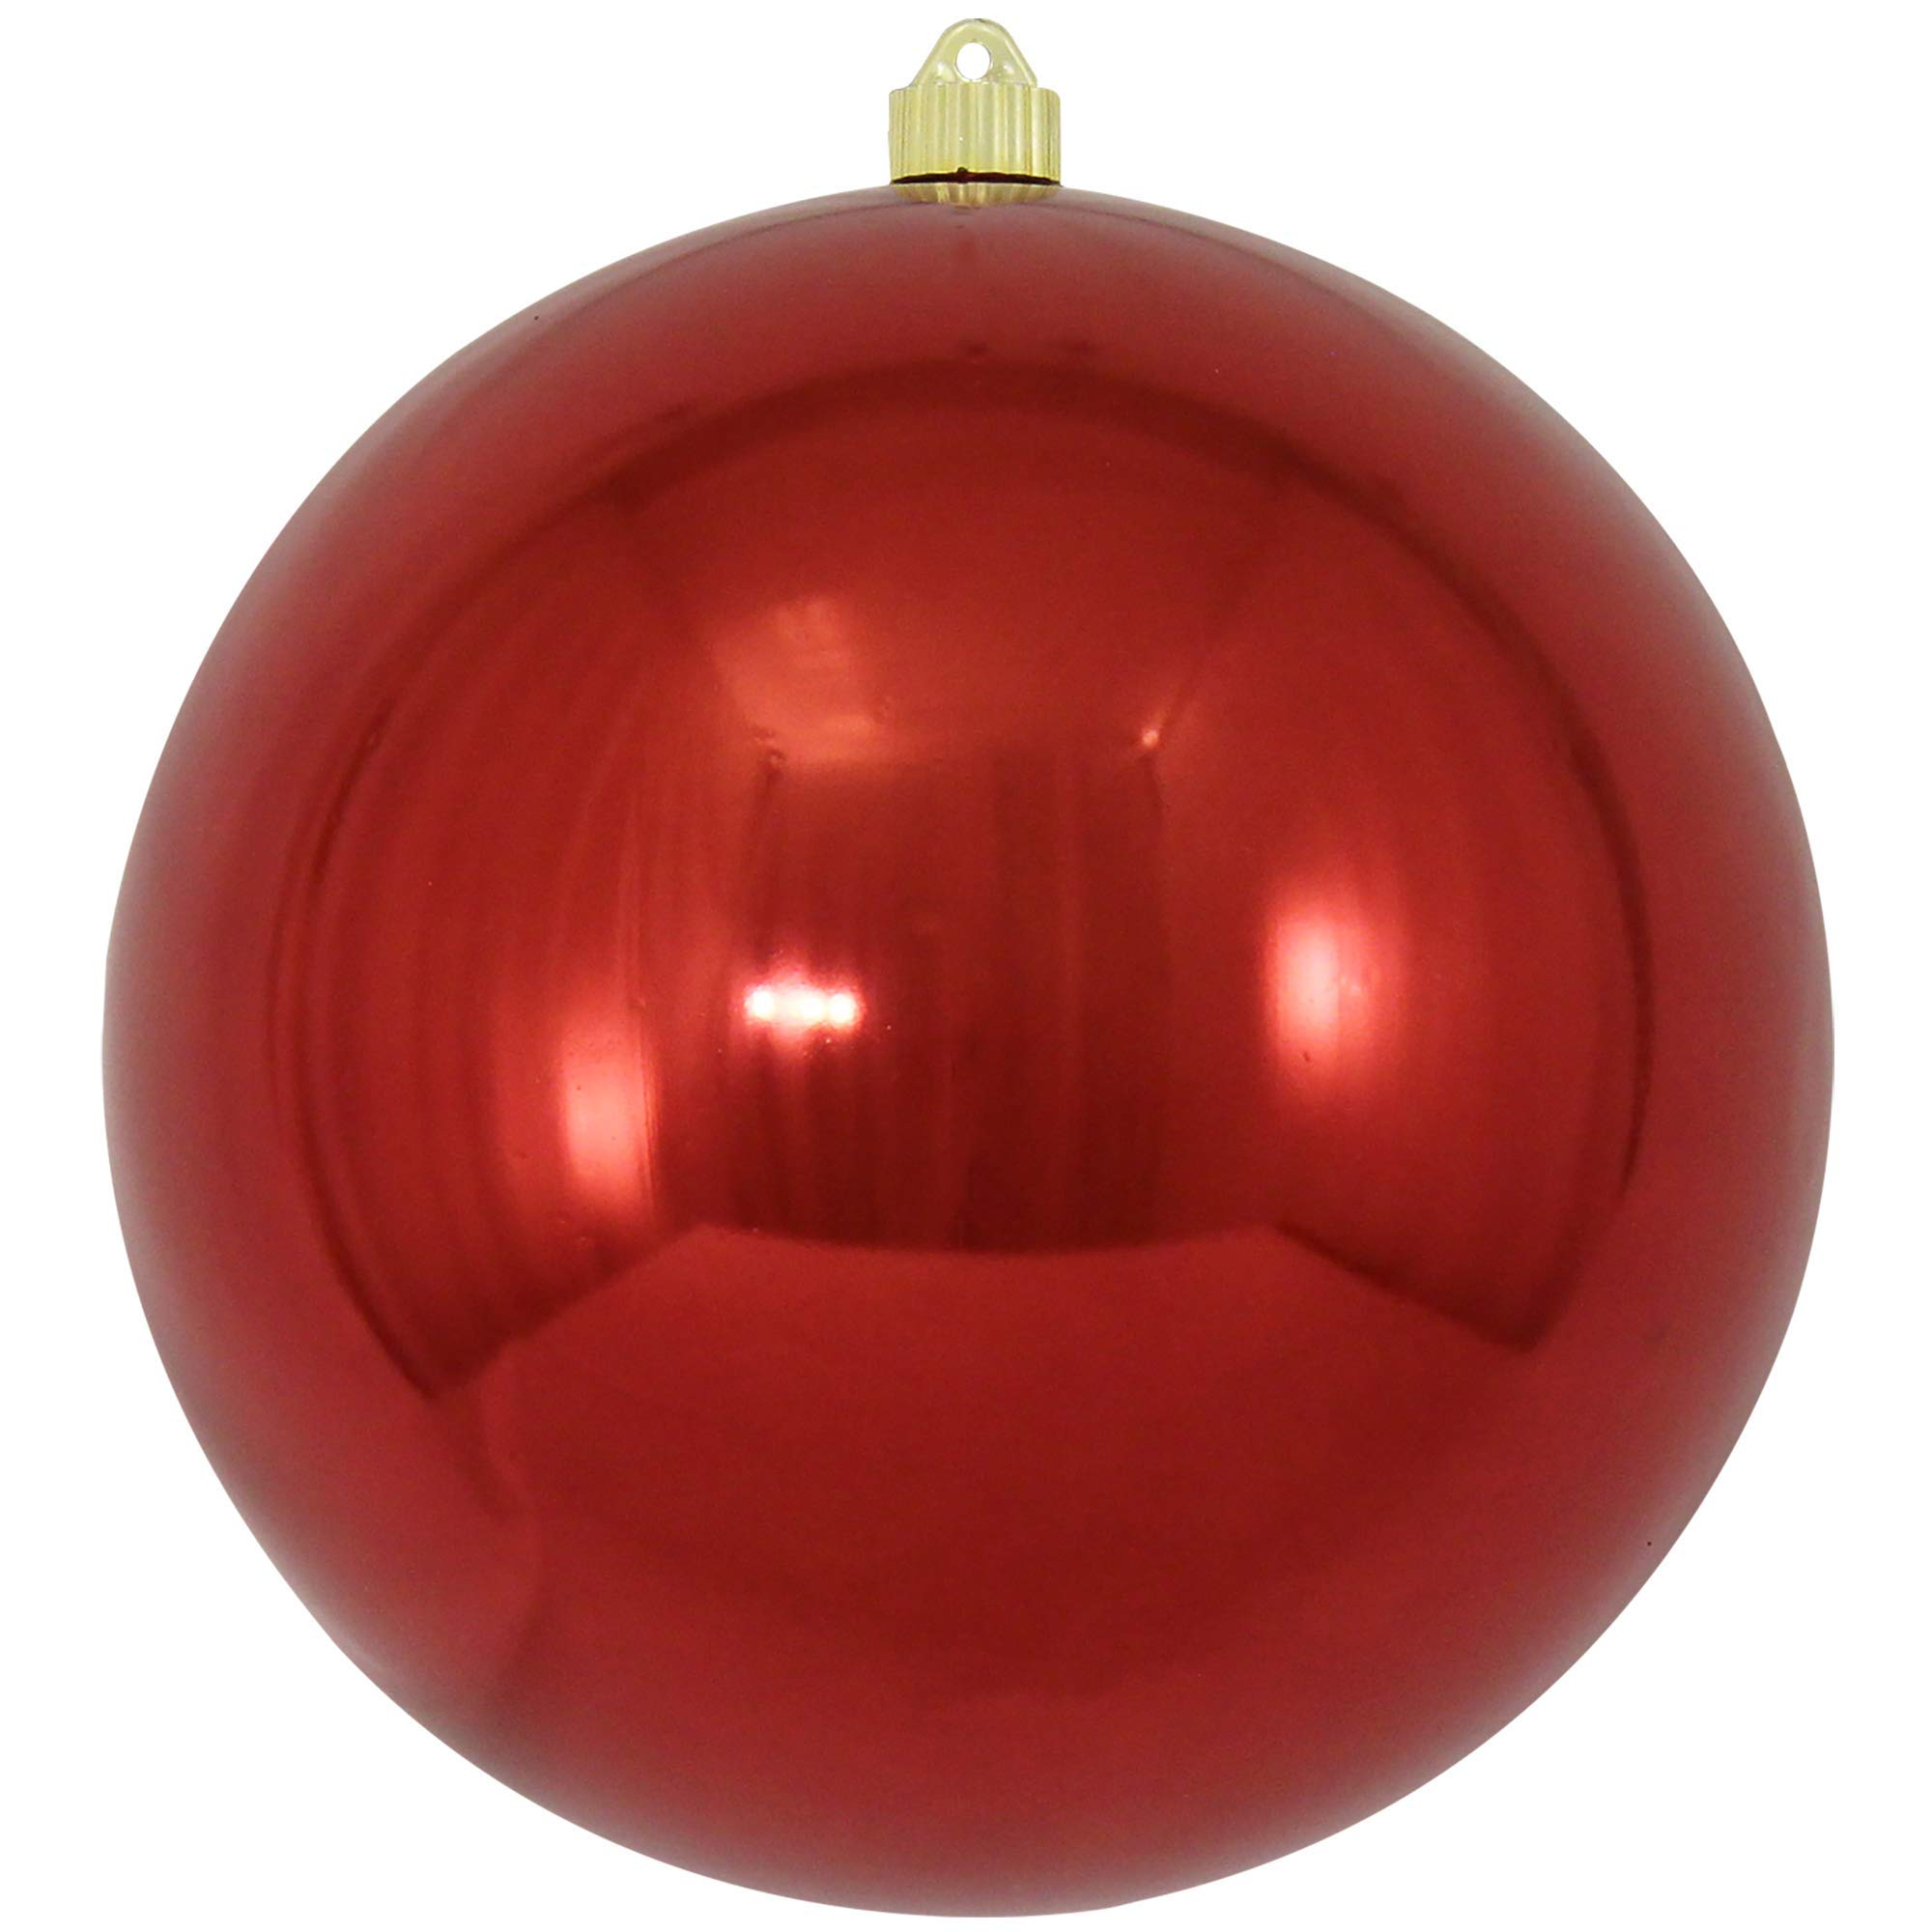 Christmas By Krebs CBK40519 Shatterproof UV-Resistant Christmas Ball Ornaments, Sonic Red, 10''